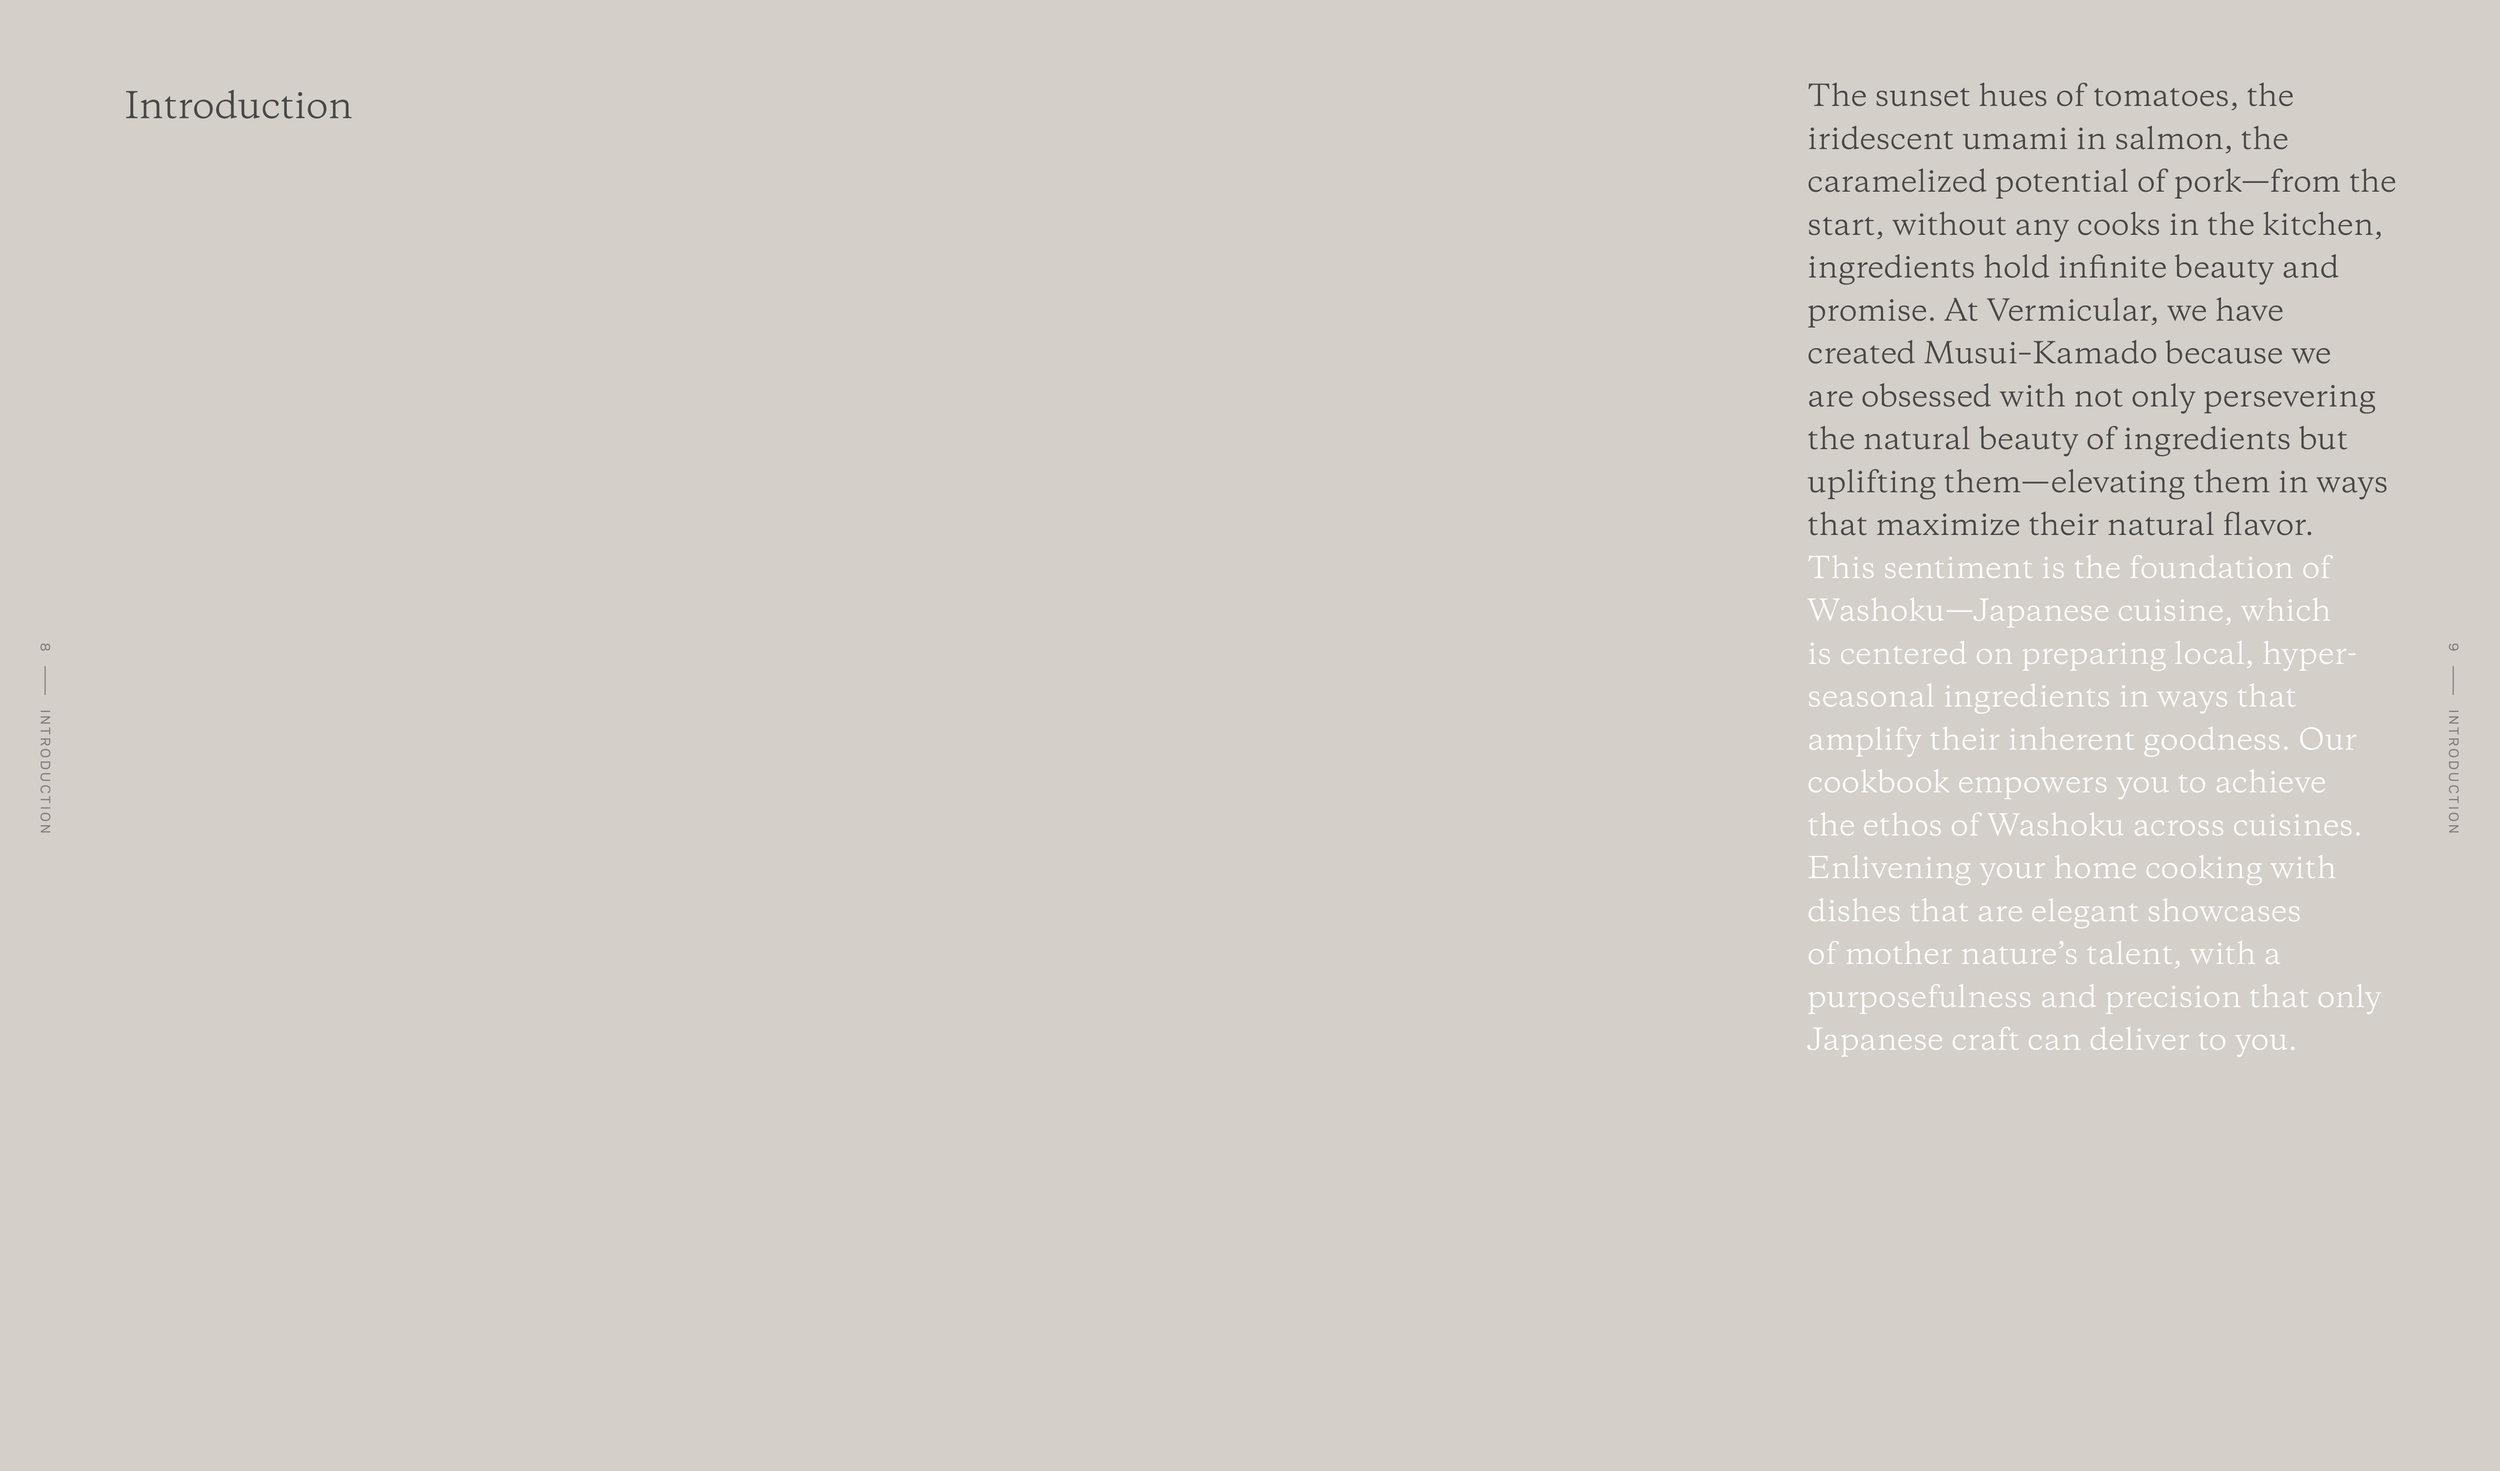 Vermicular_Cookbook_Intro.jpg